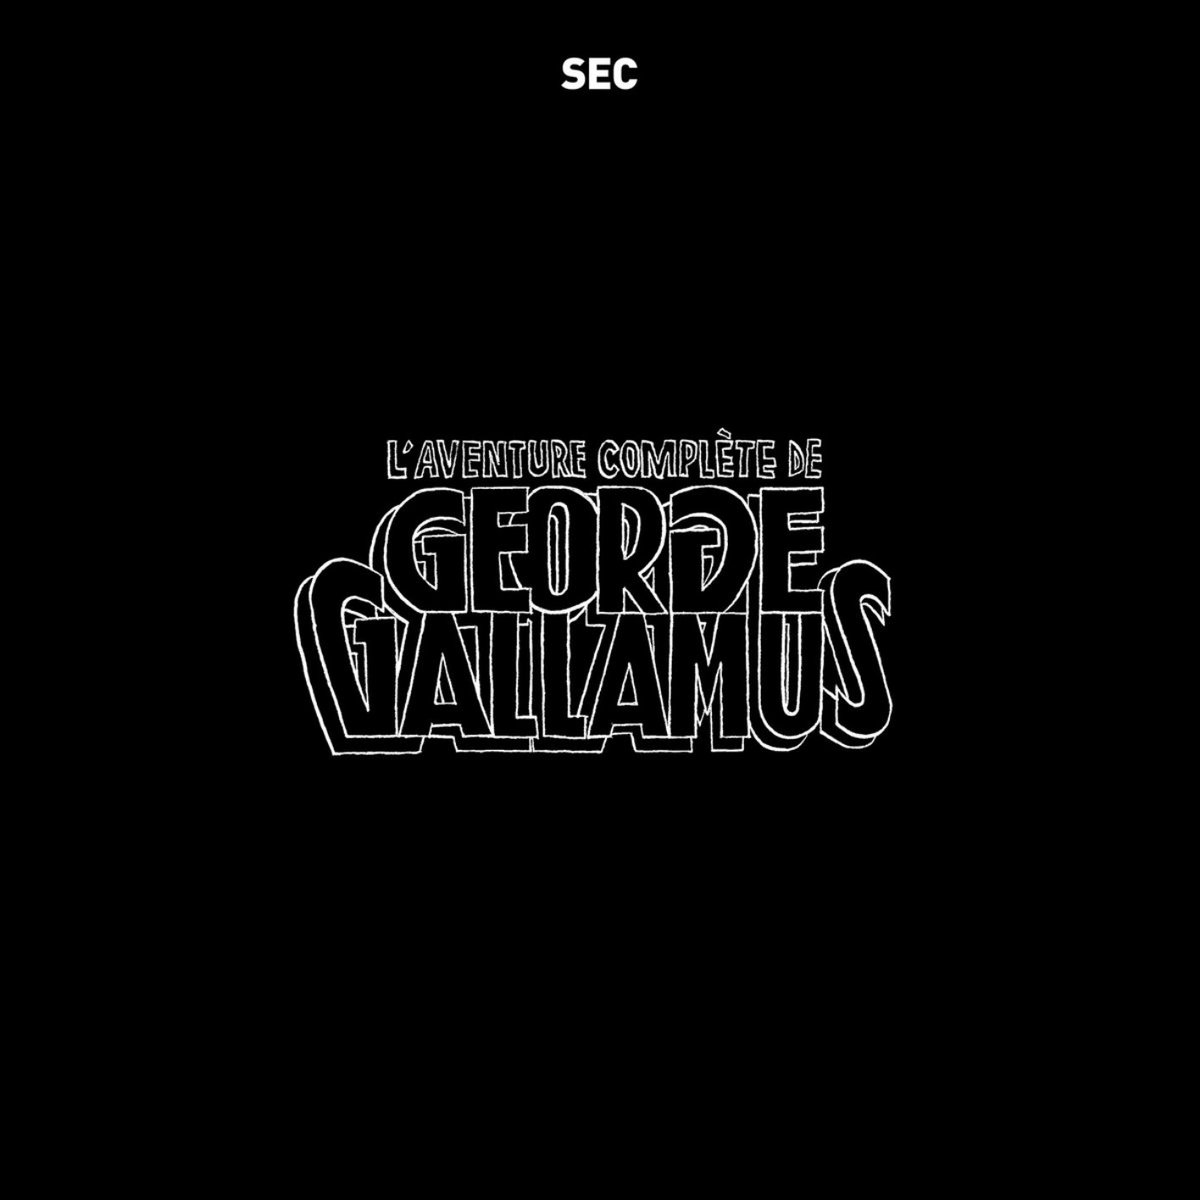 SEC - L'aventure complète de George Gallamus